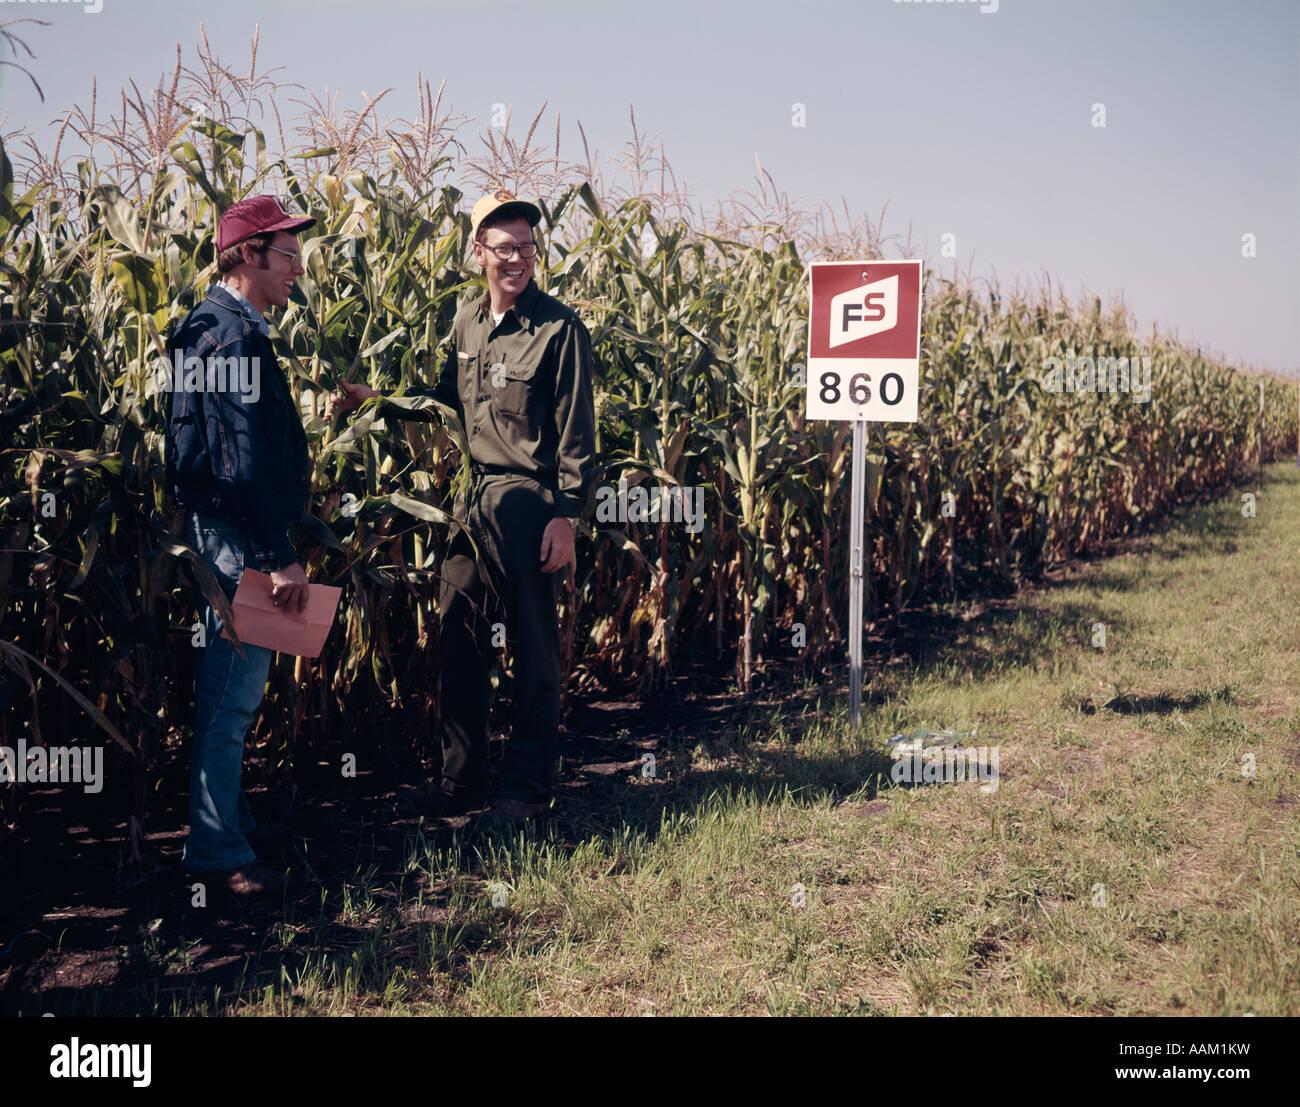 1970s FARMERS CHECKING DEMONSTRATION PLOTS OF HYBRID CORN - Stock Image